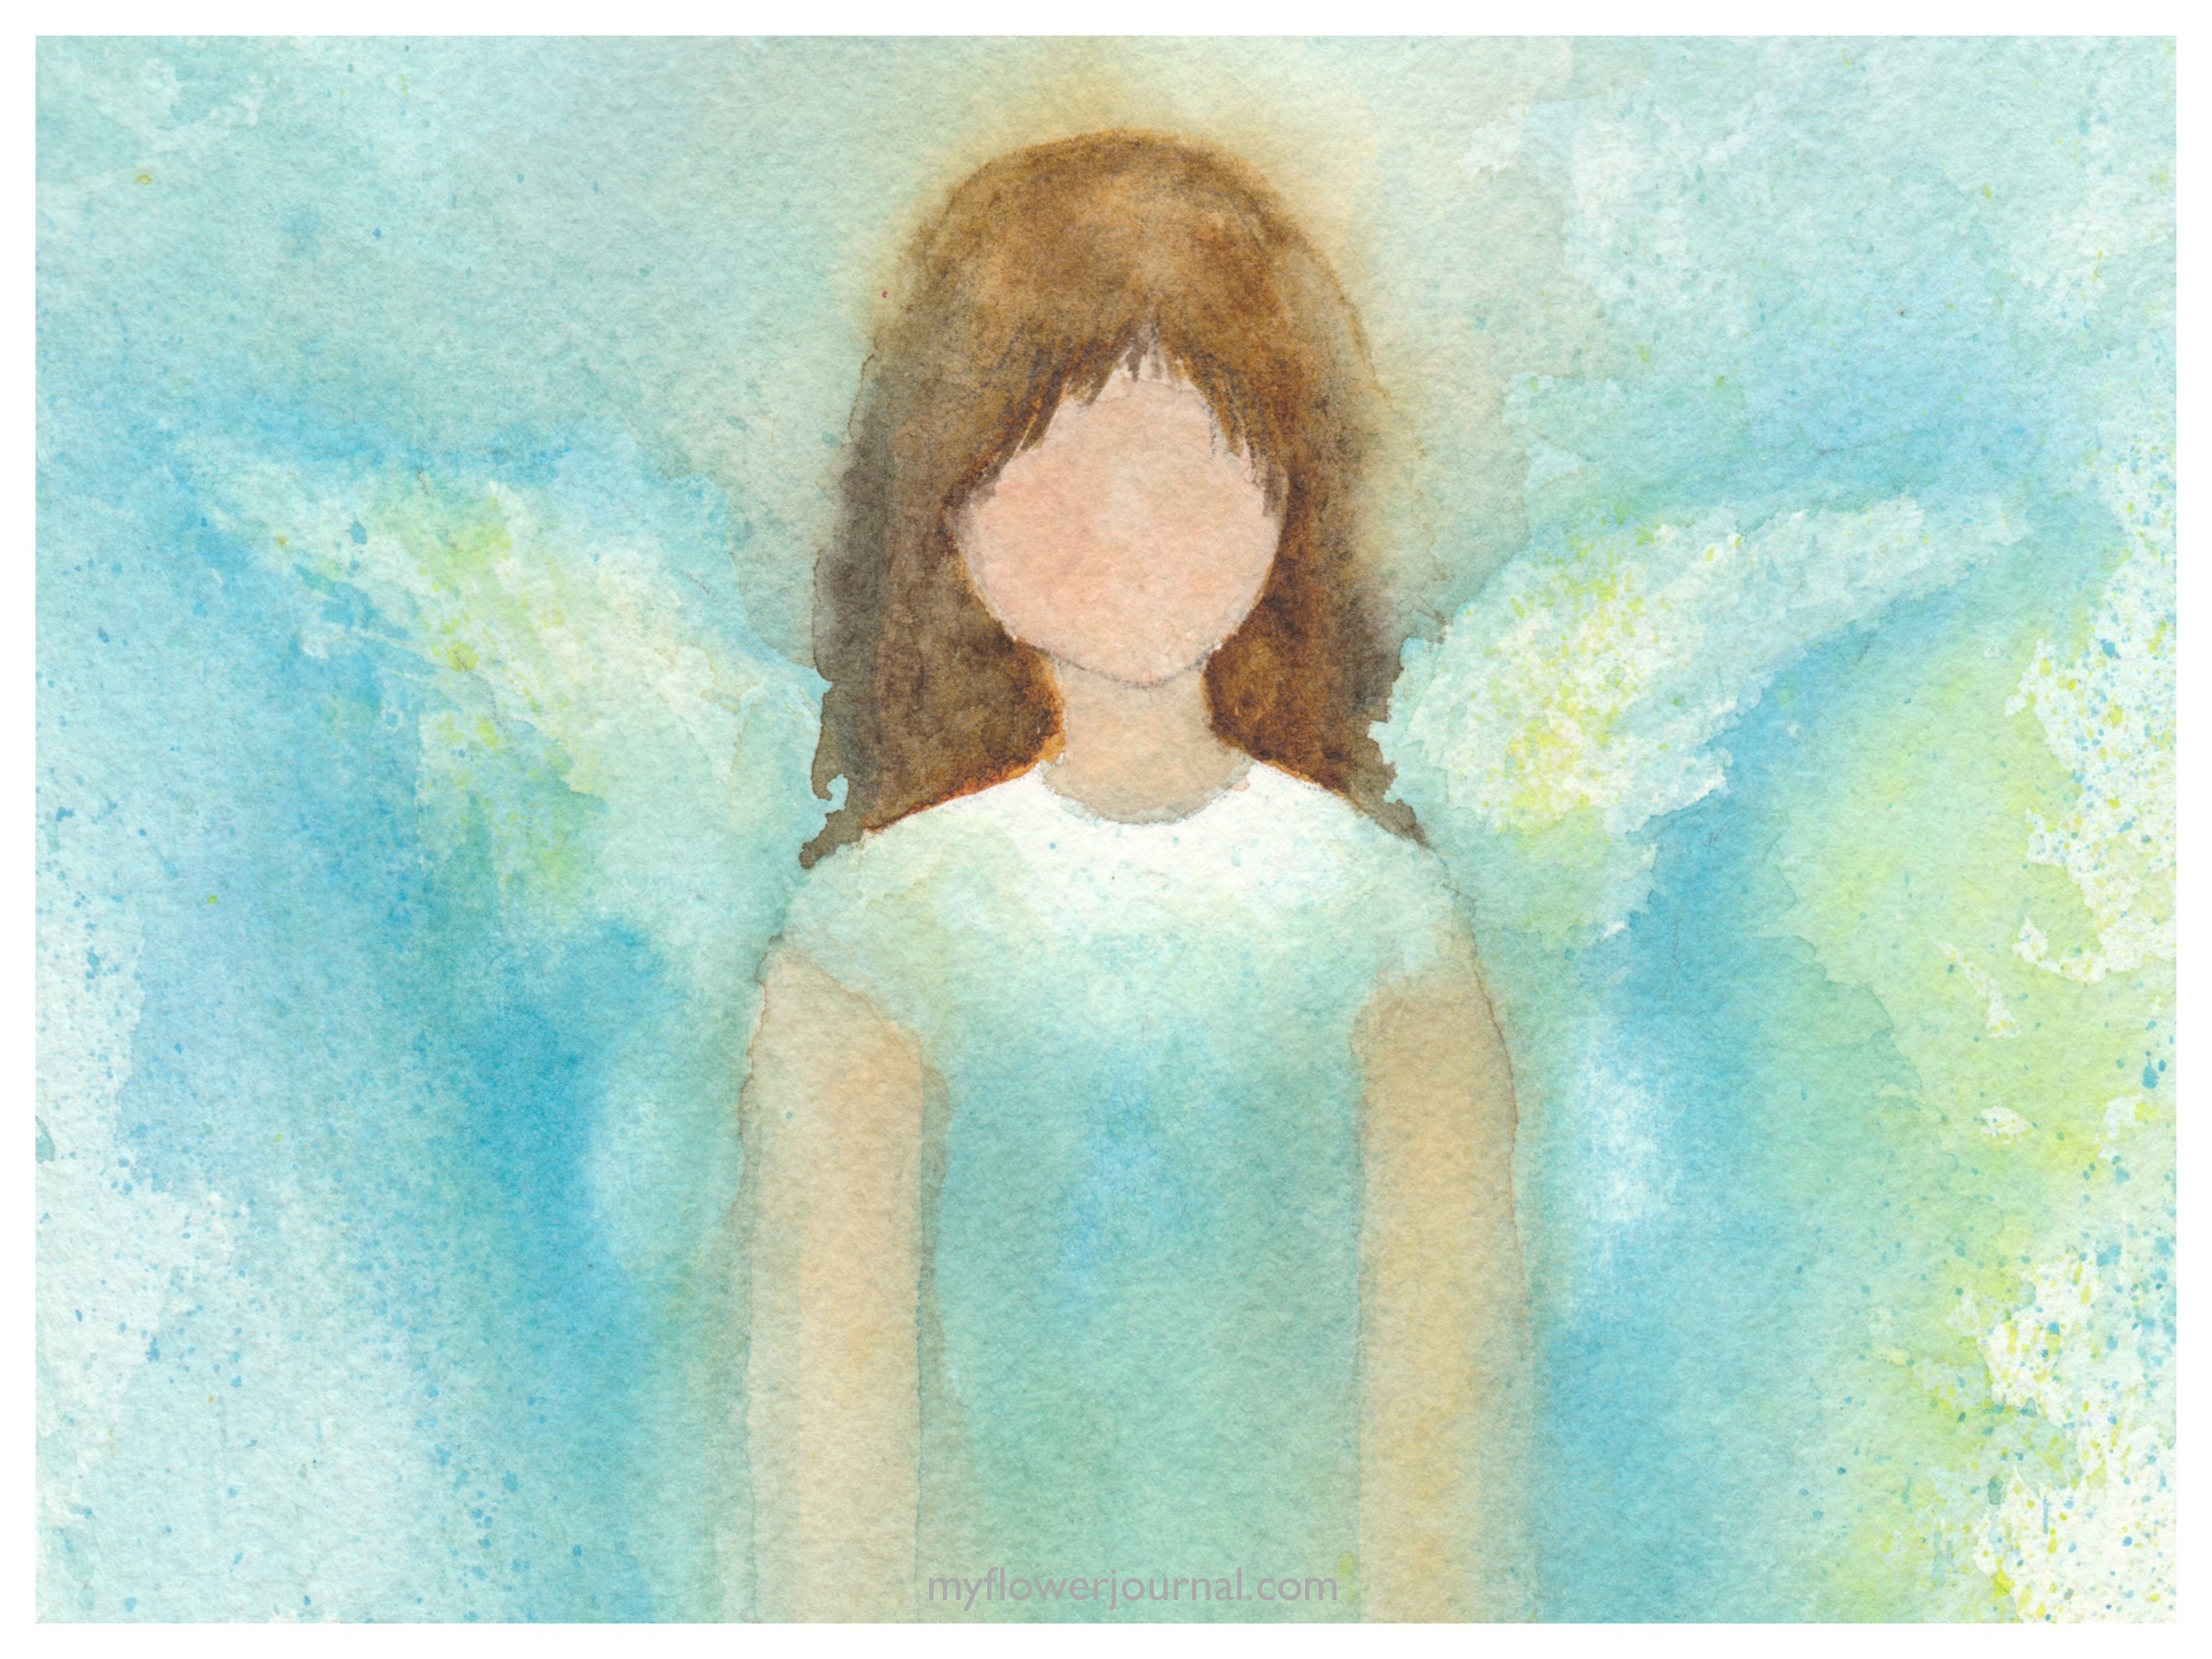 Angel in Watercolor - My Flower Journal